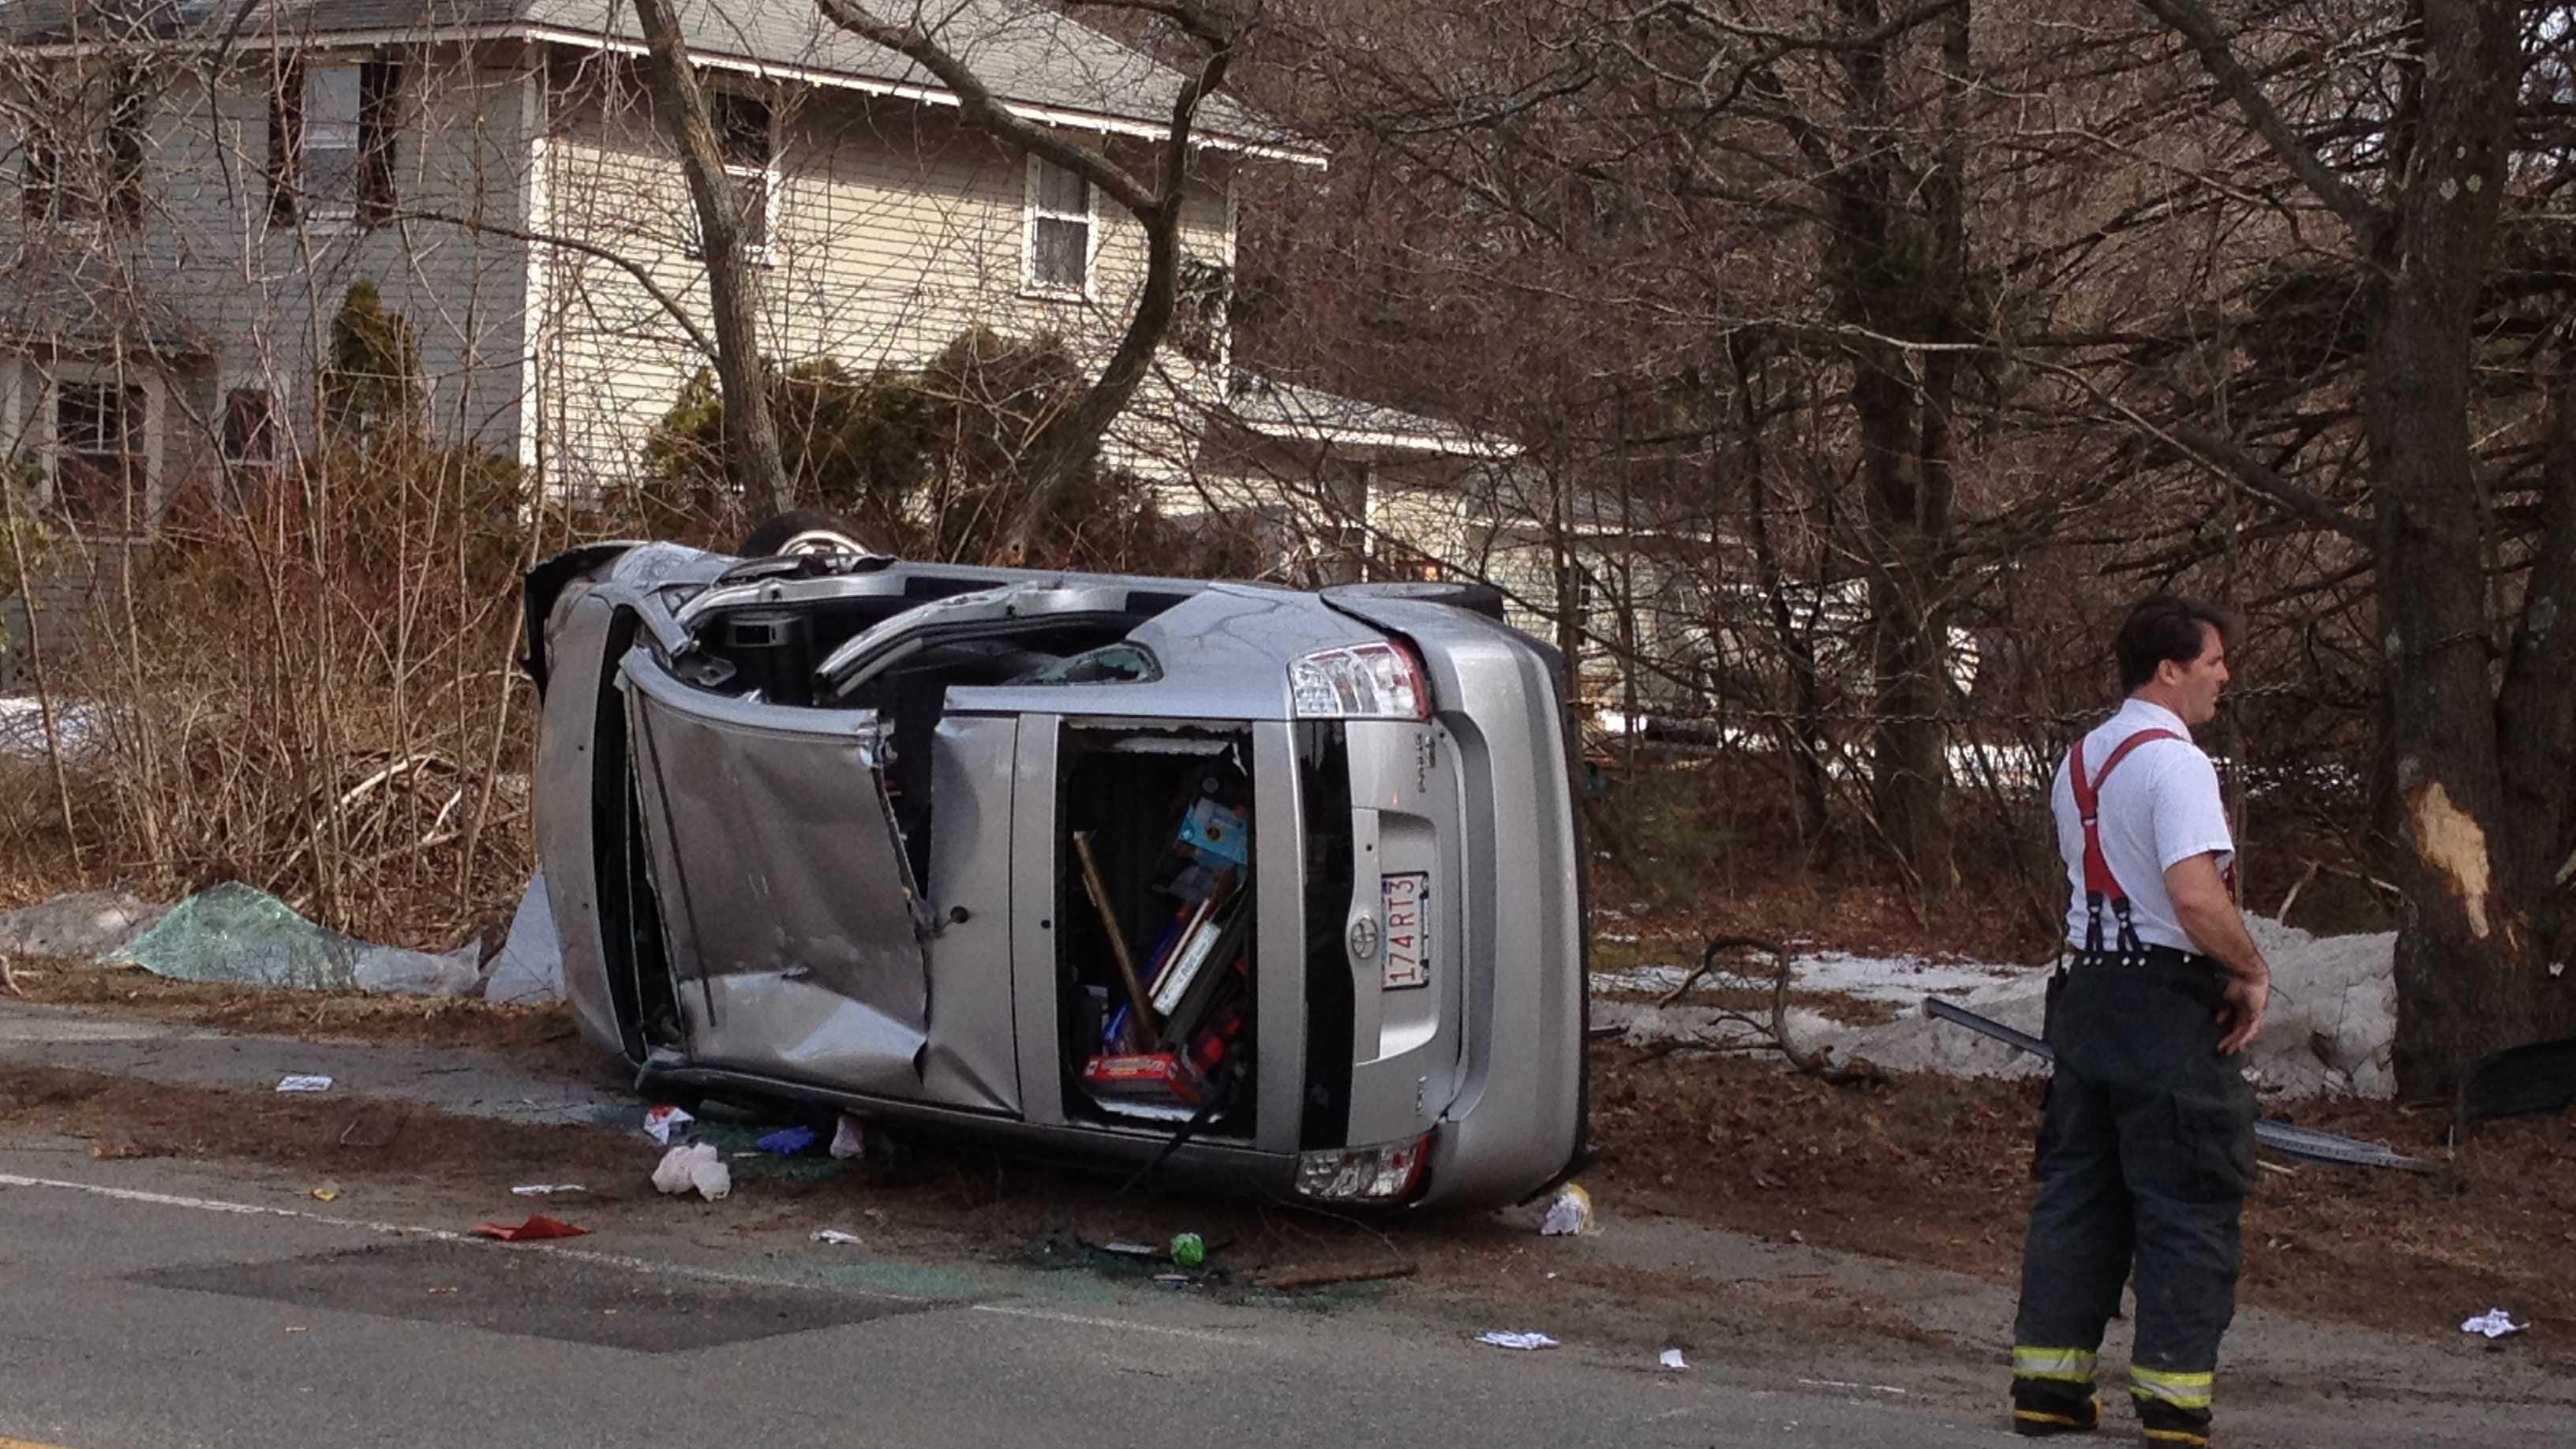 031813 Bedord Crash.JPG